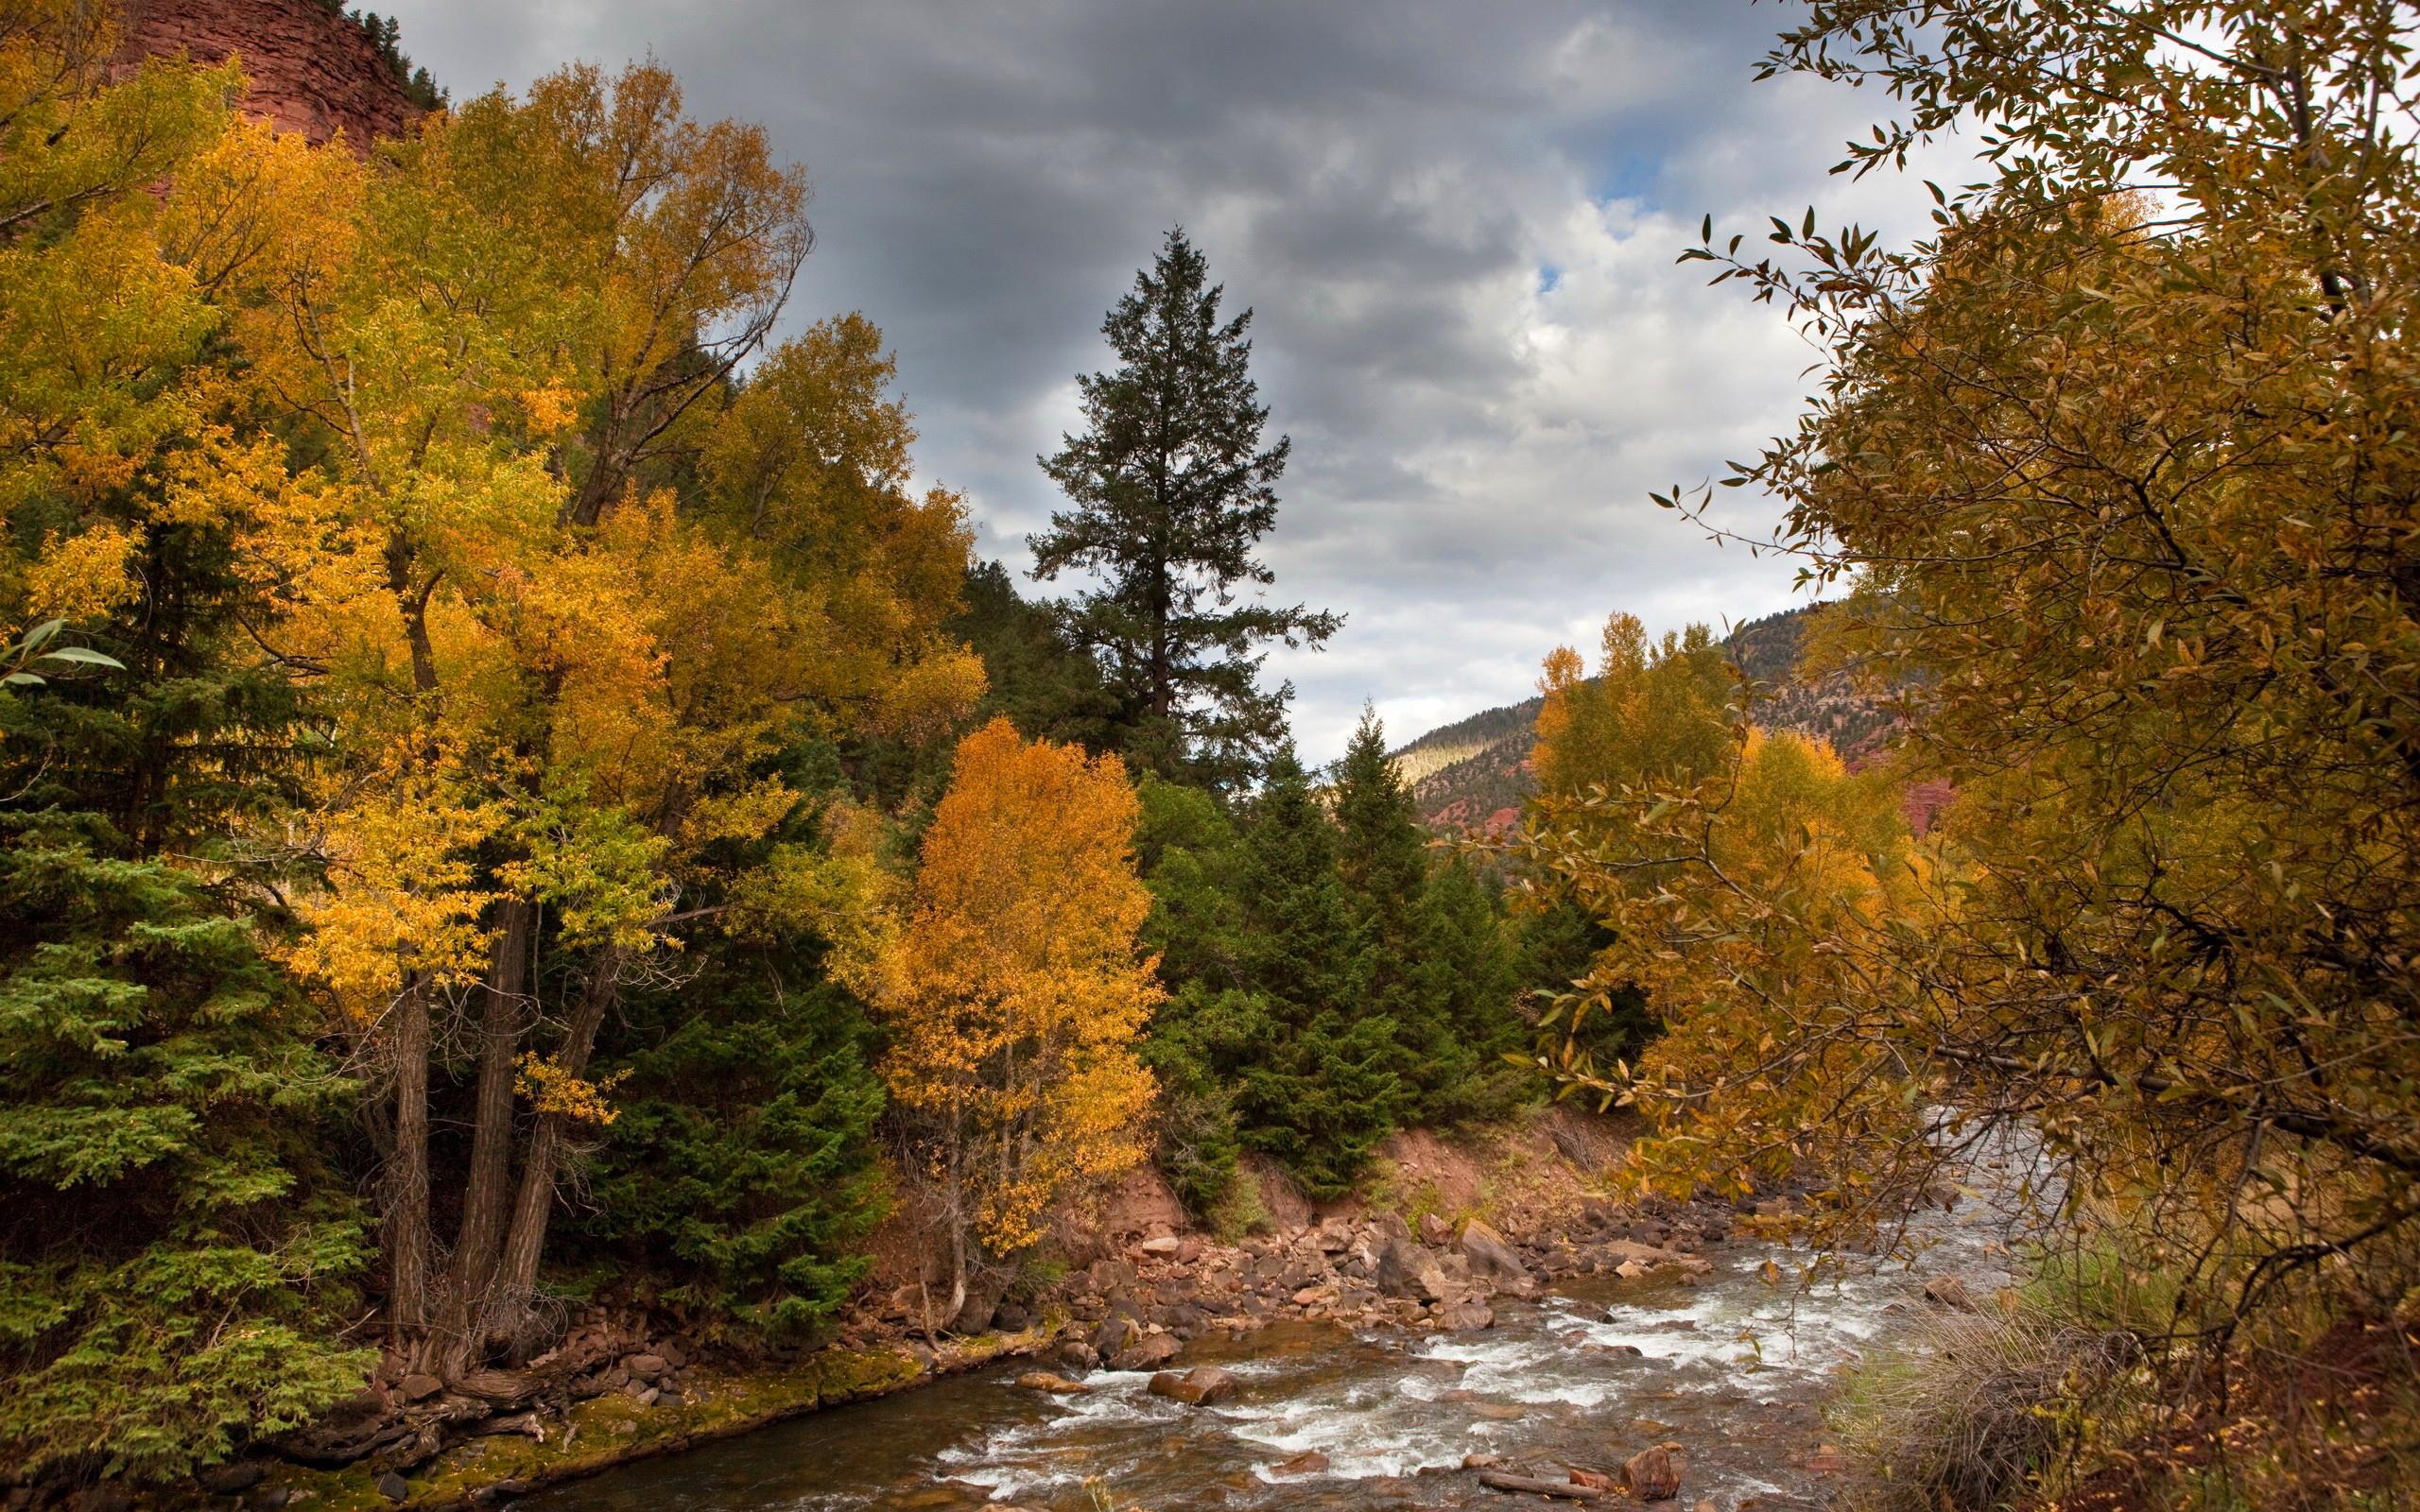 природа горы облака деревья река nature mountains clouds trees river  № 1000522 бесплатно